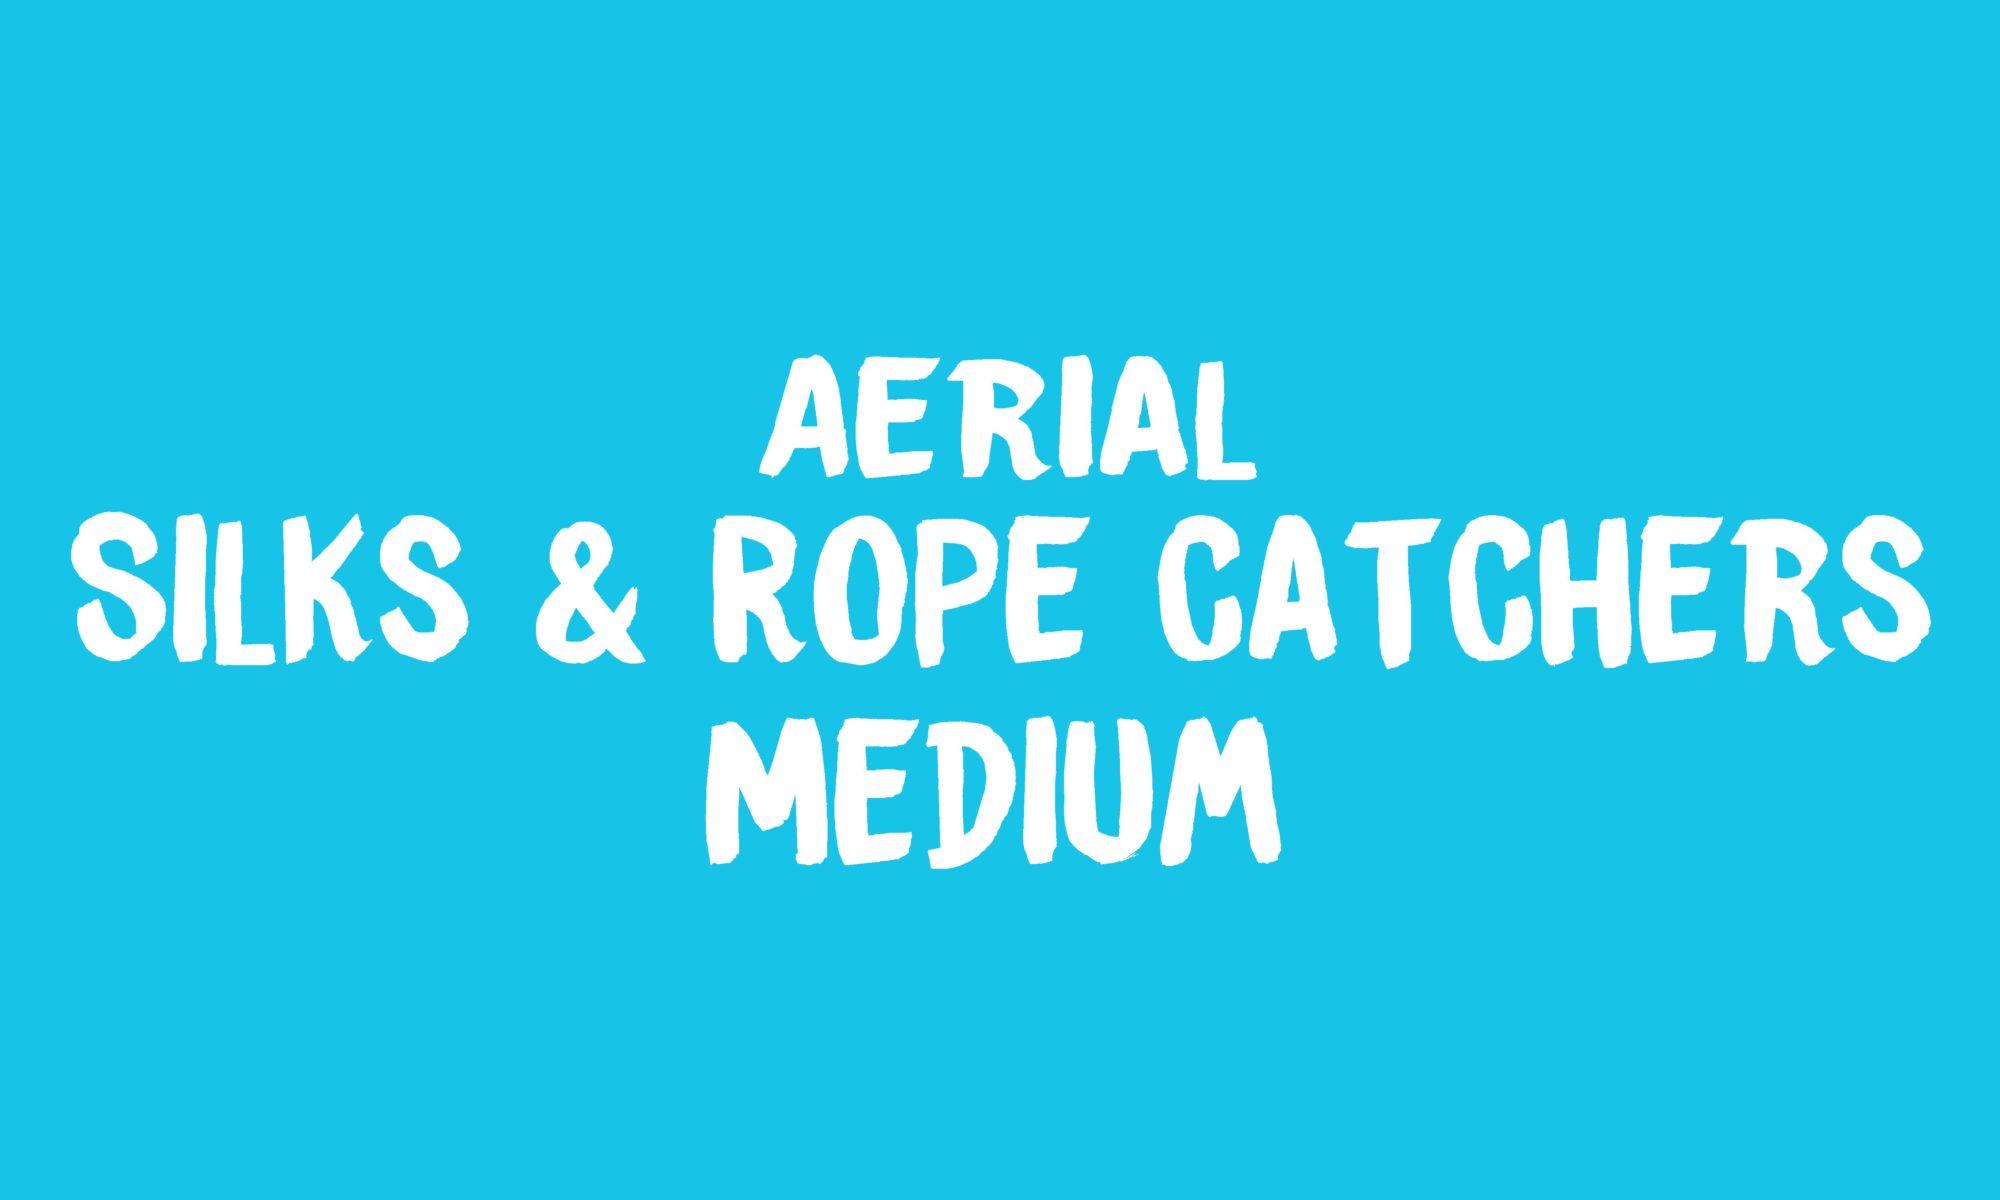 Aerial Silks & Rope Catchers Banner